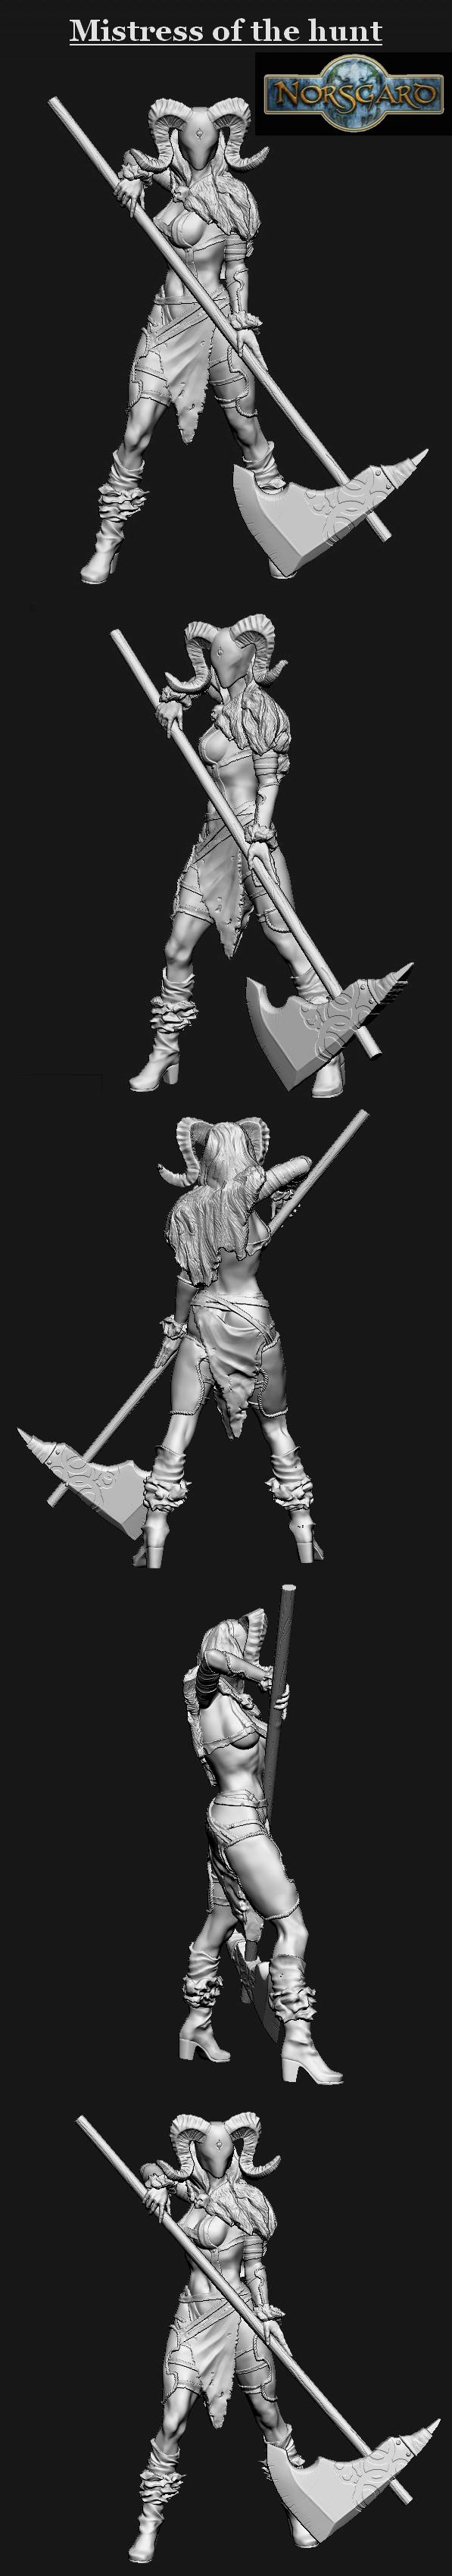 Mistress of the hunt (Zbrush digital sculpt)